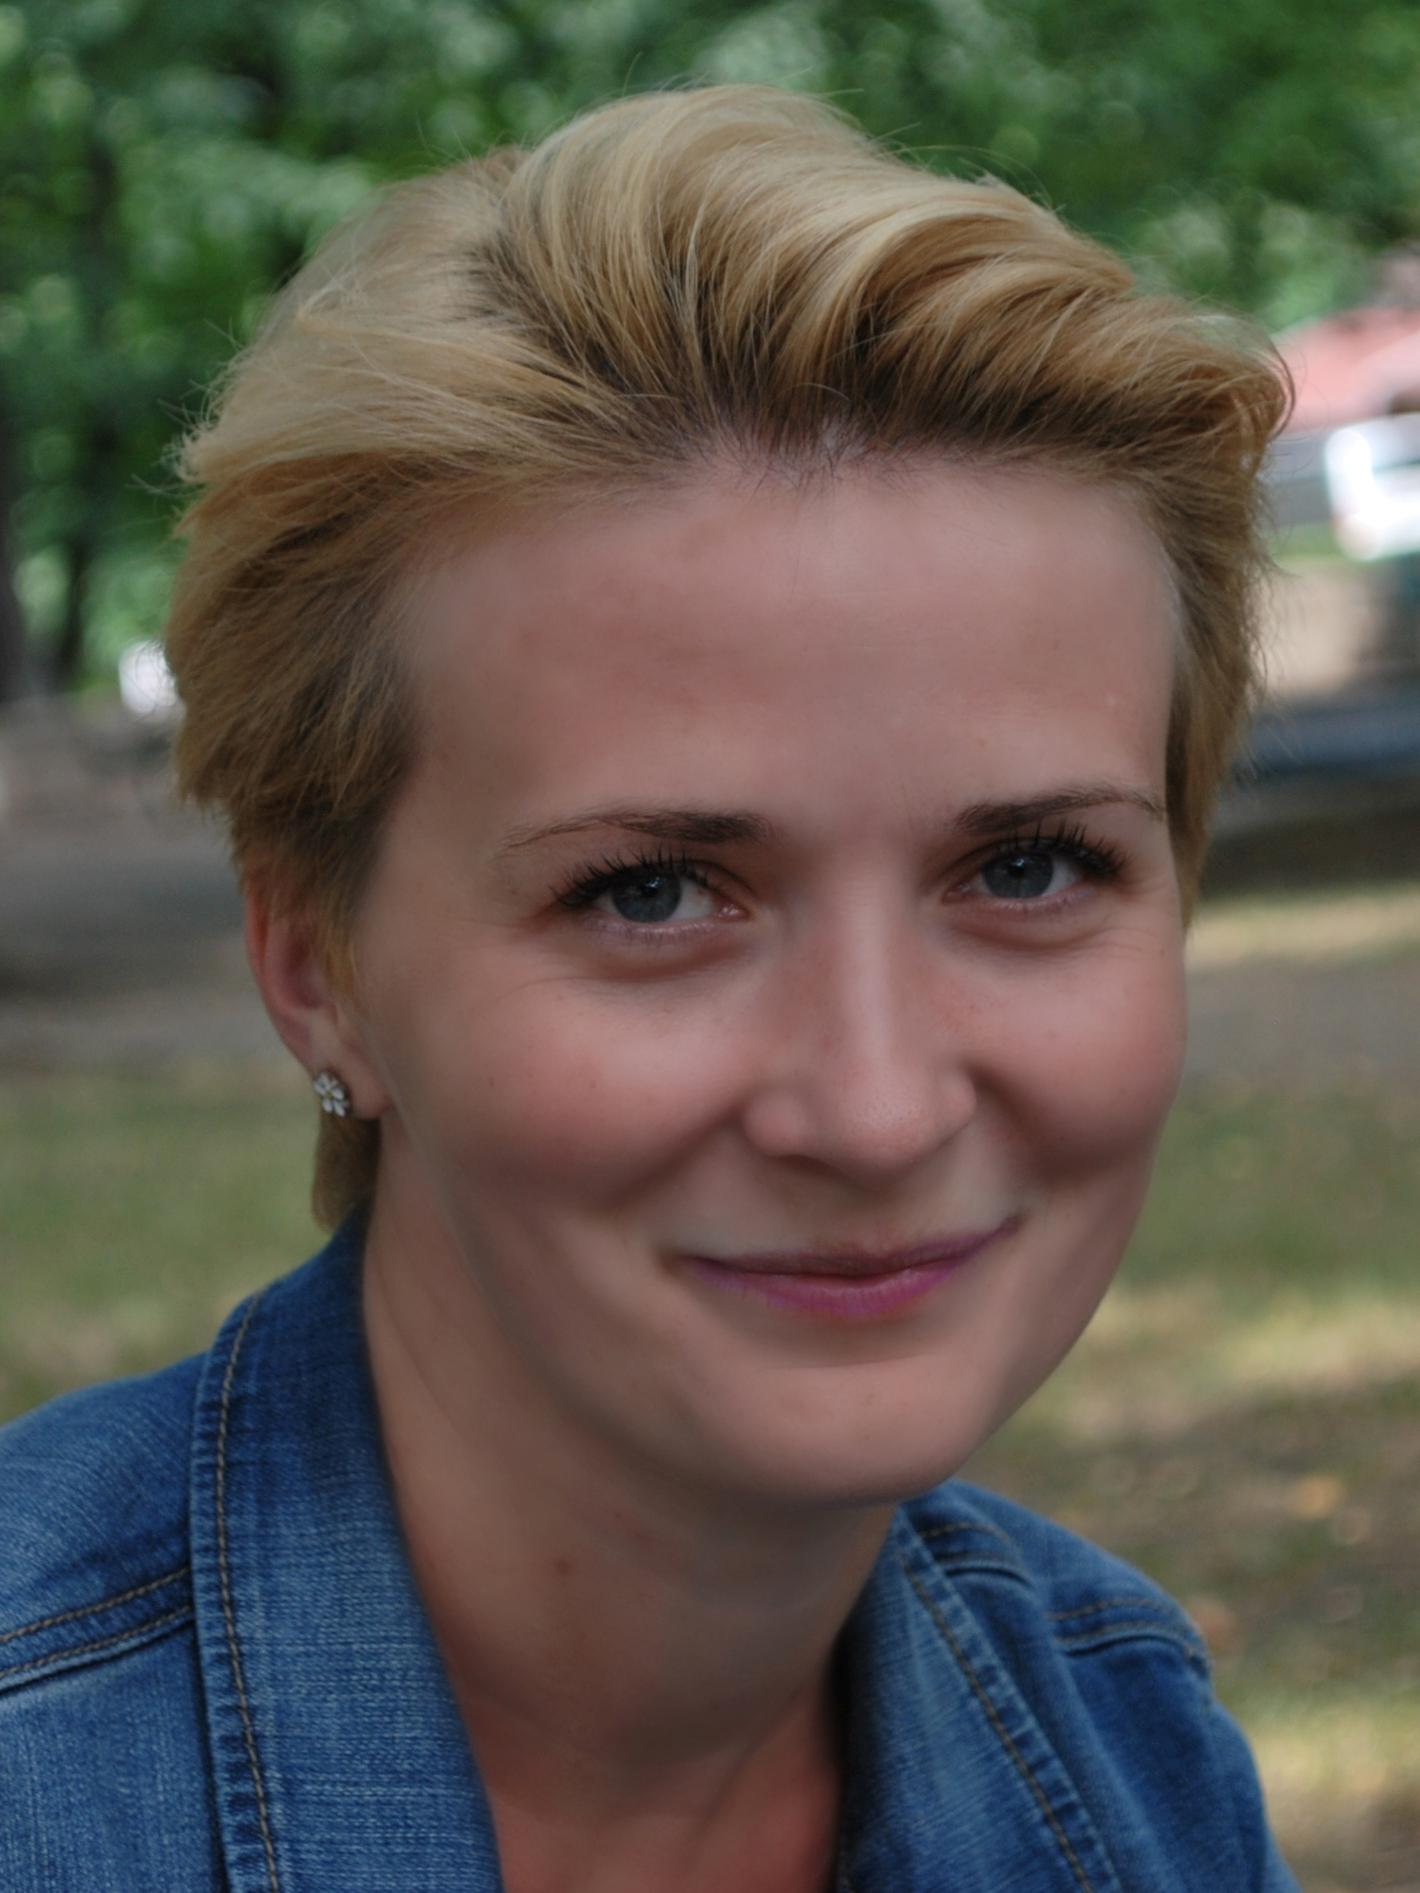 Kierownik Aneta Solarz